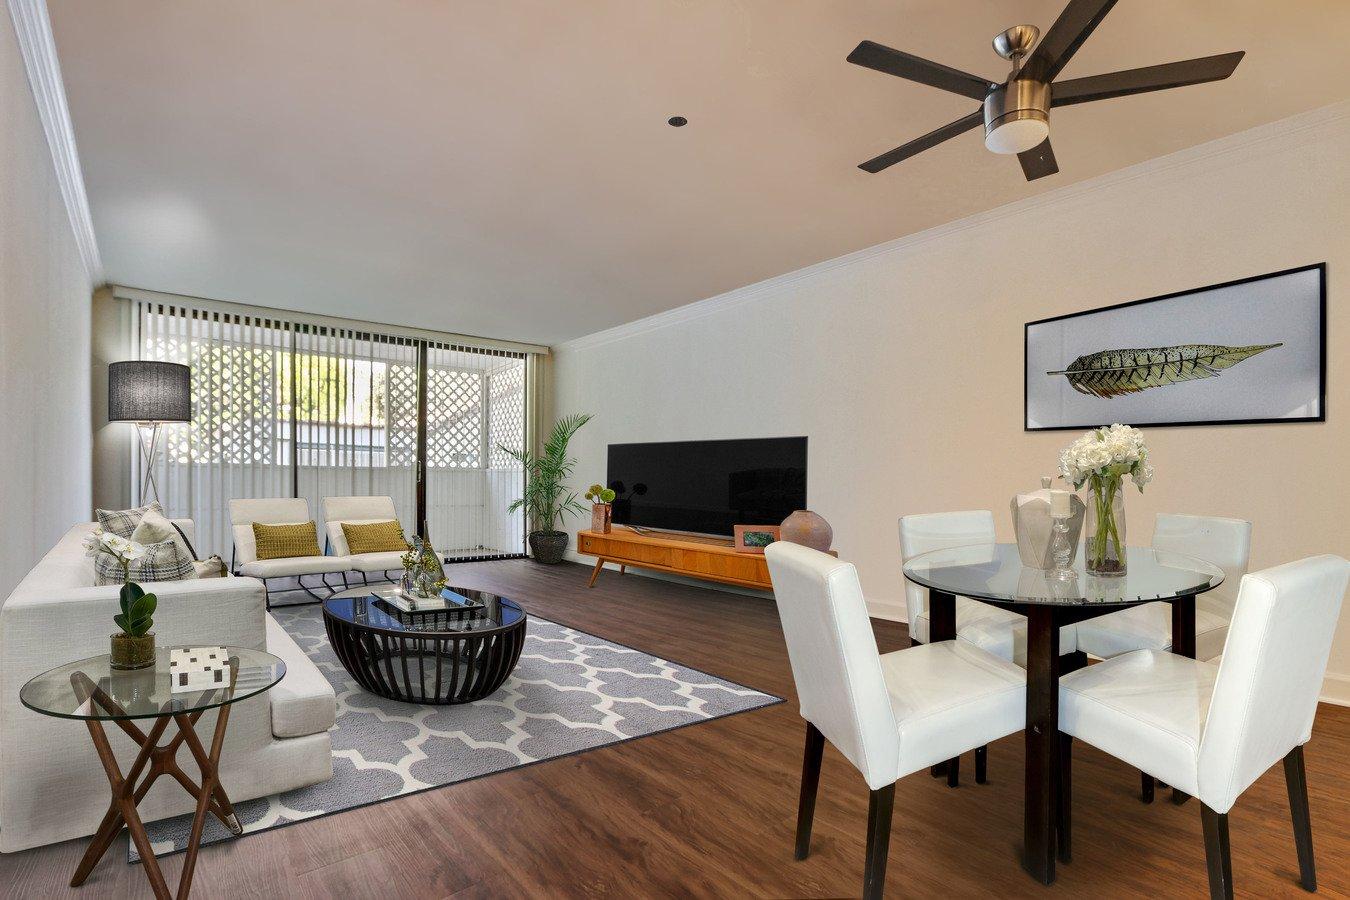 2 Bedrooms 2 Bathrooms Apartment for rent at Montana Avenue in Santa Monica, CA